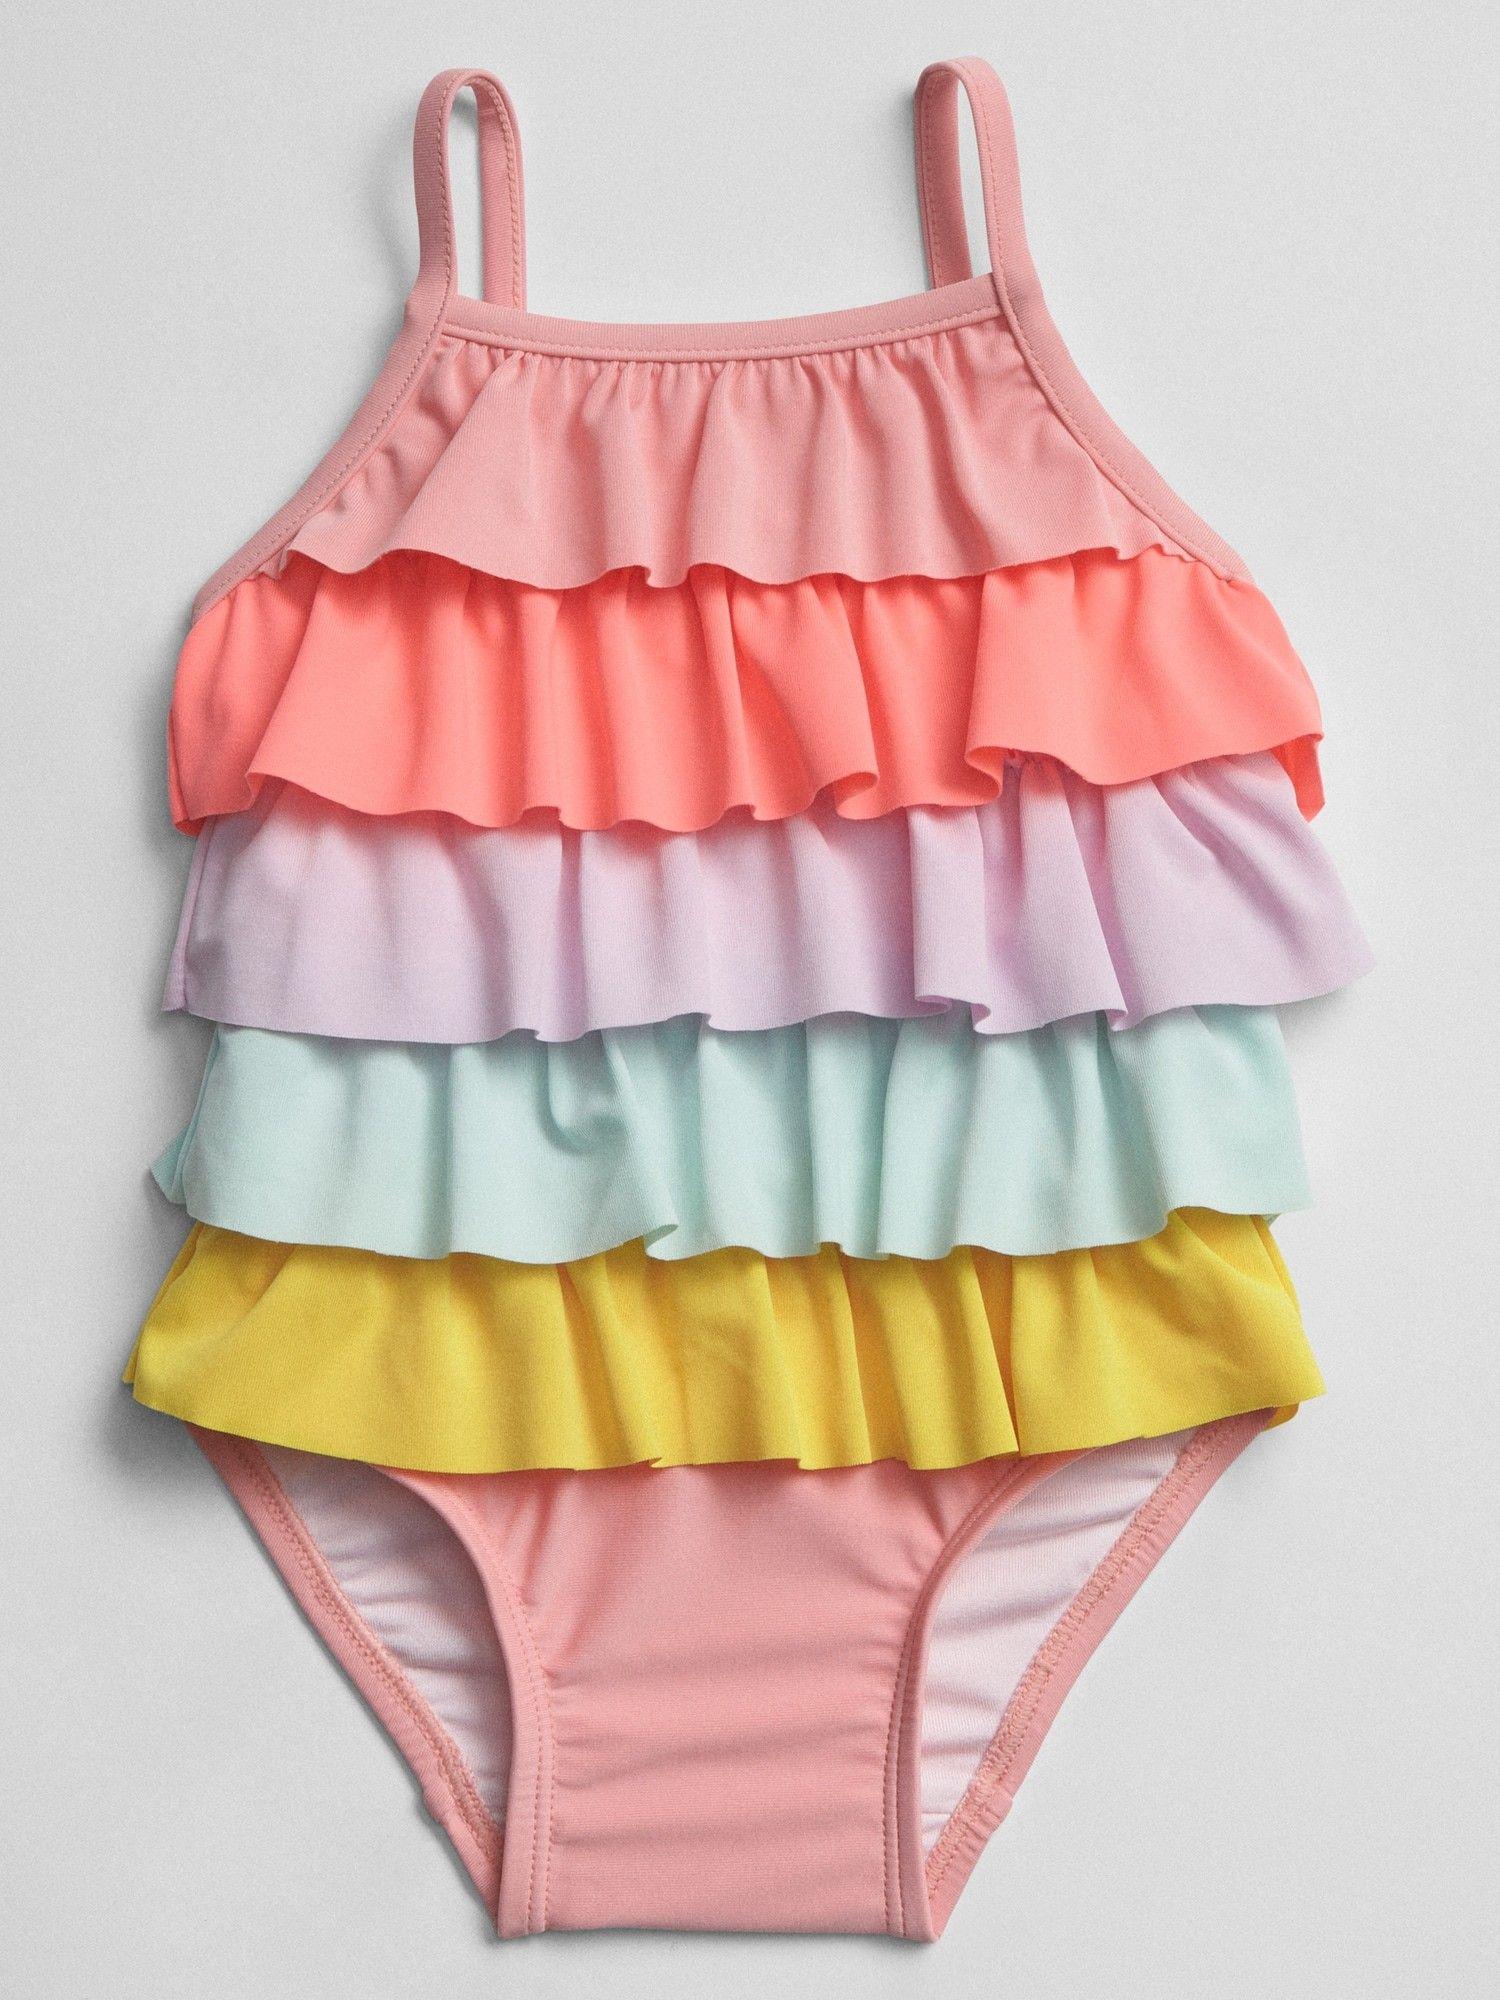 Freebily Toddler Baby Girls One Piece Striped Swimsuit Cutie Bowknot Ruffle Swimwear Swimming Costumes